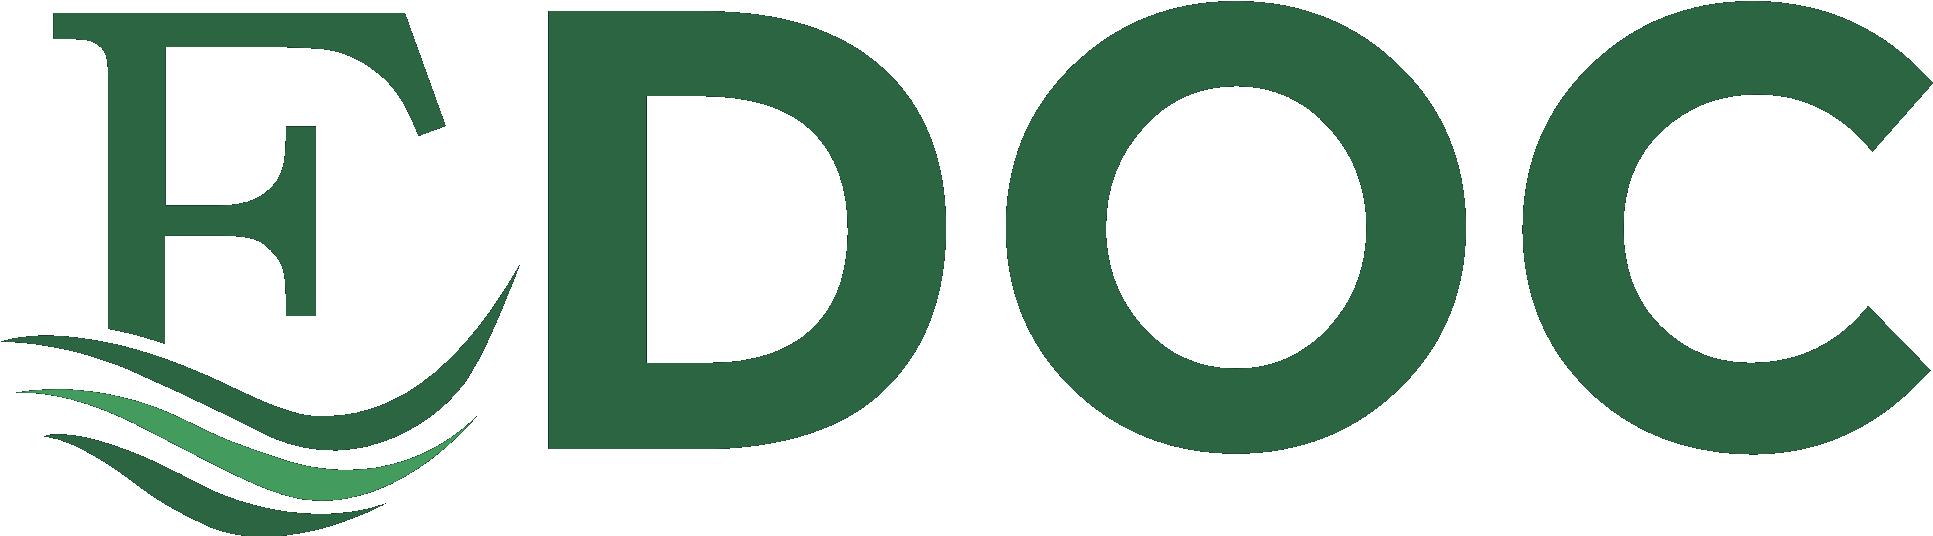 calico látás diagram